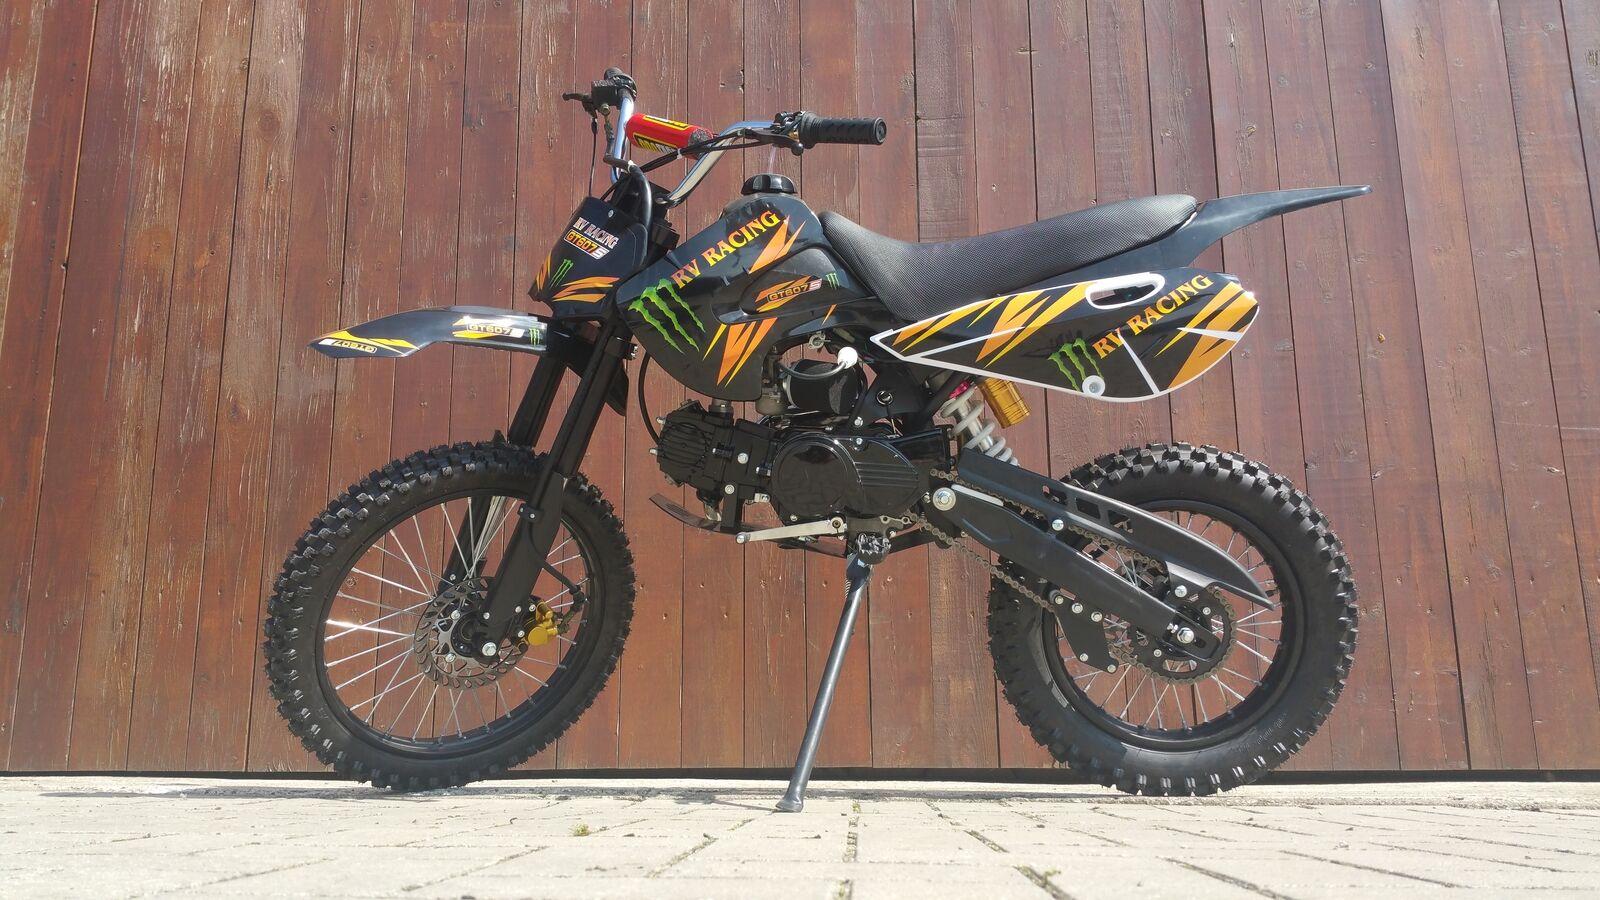 125ccm Dirtbike Pitbike 4 Takt 4 Gang 17/14 Zoll Schwarz Enduro Cross Motor